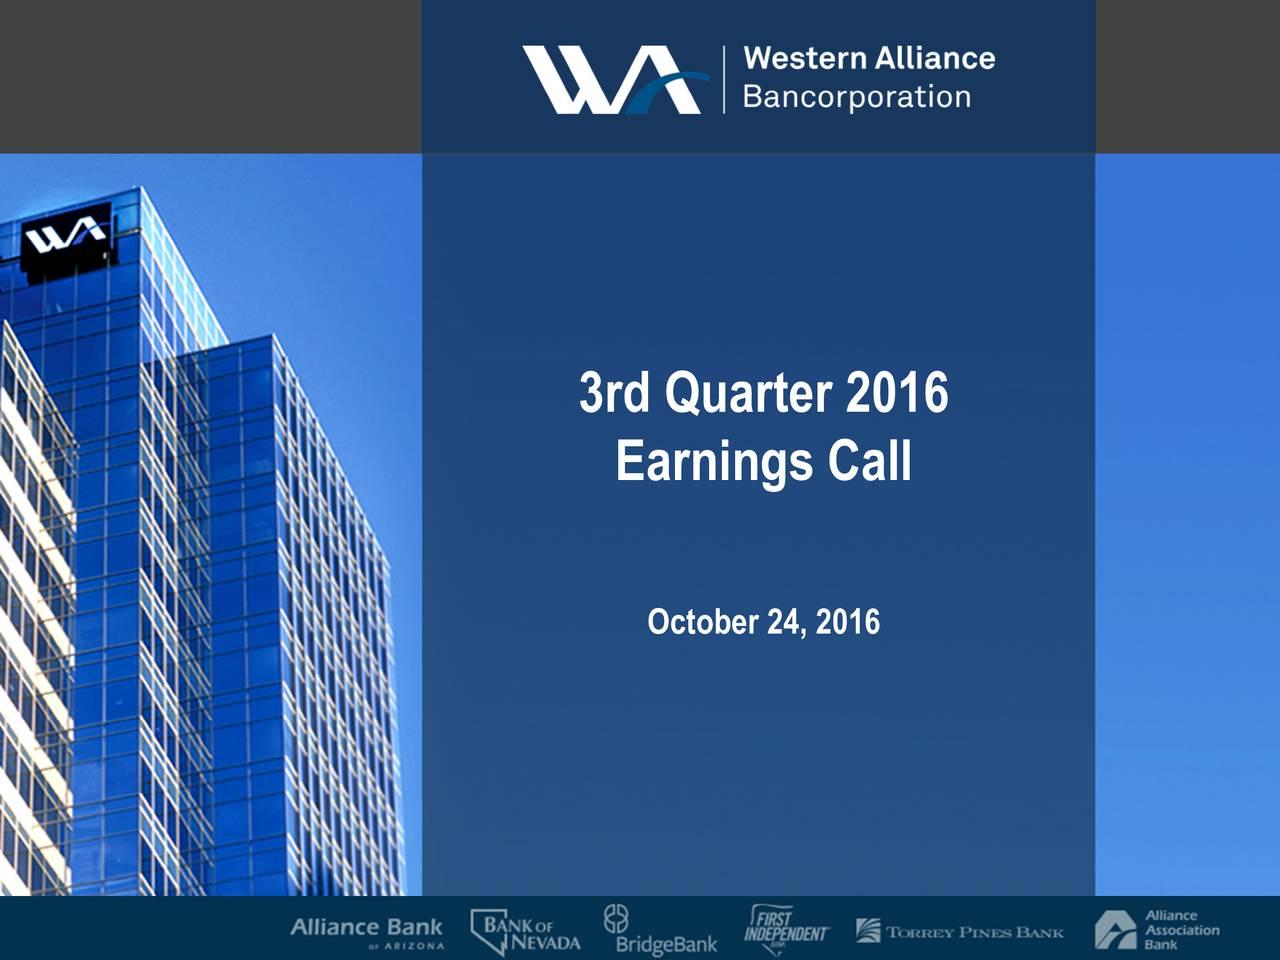 Earnings Call October24, 2016